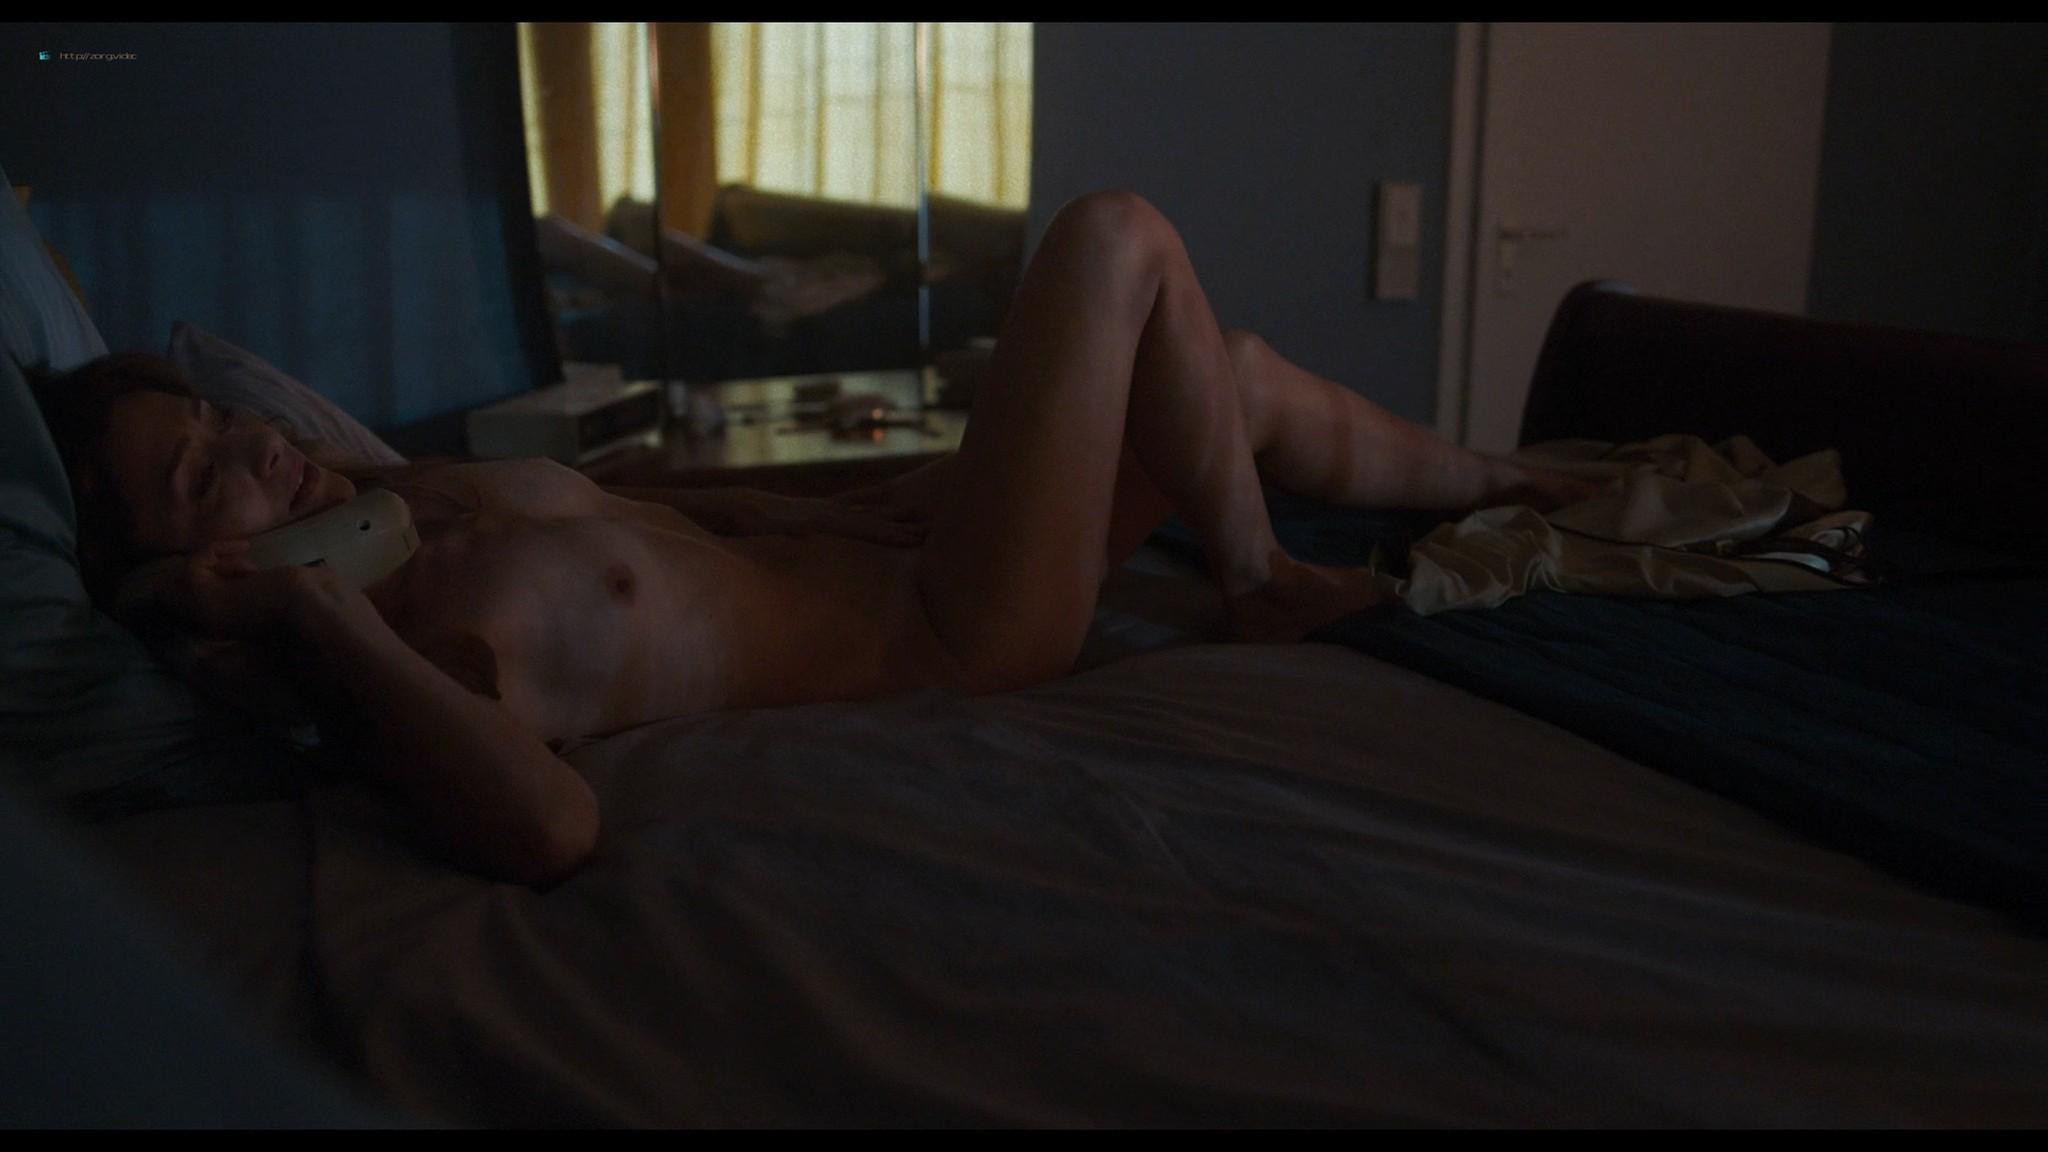 Maria Fernanda Cândido nude Marilina Marino nude sex - The Traitor (2019) HD 1080p BluRay (8)